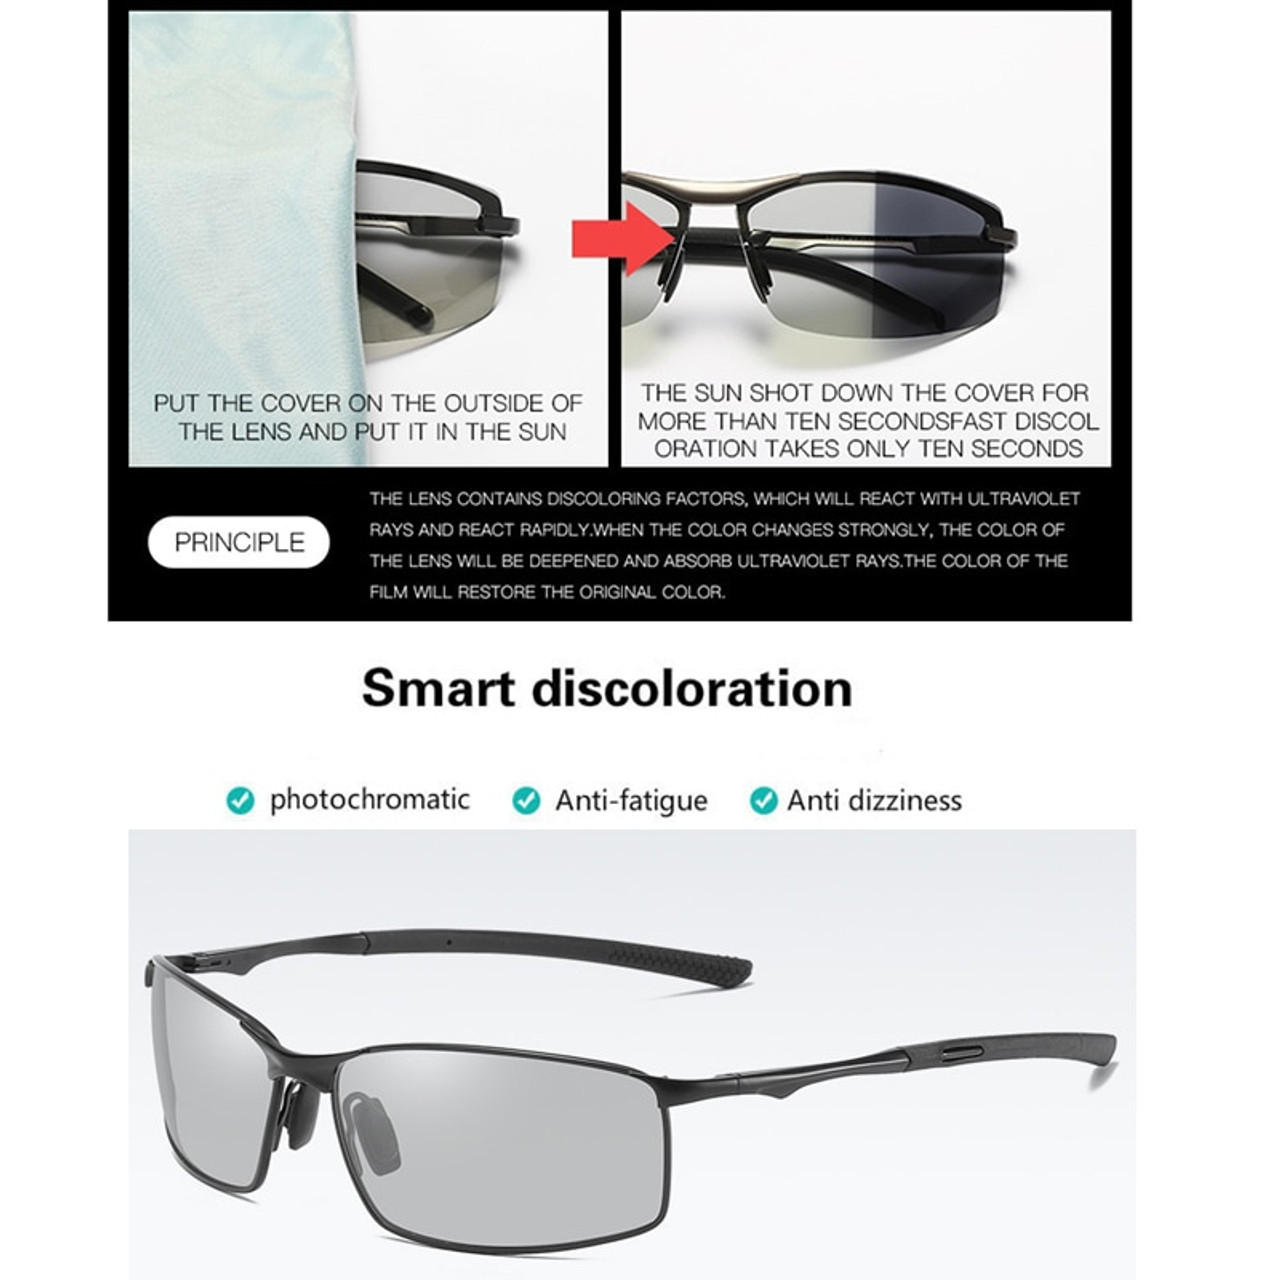 Men Photochromic Sunglasses Polarized Eyewear Transition Lens Driving Glasses